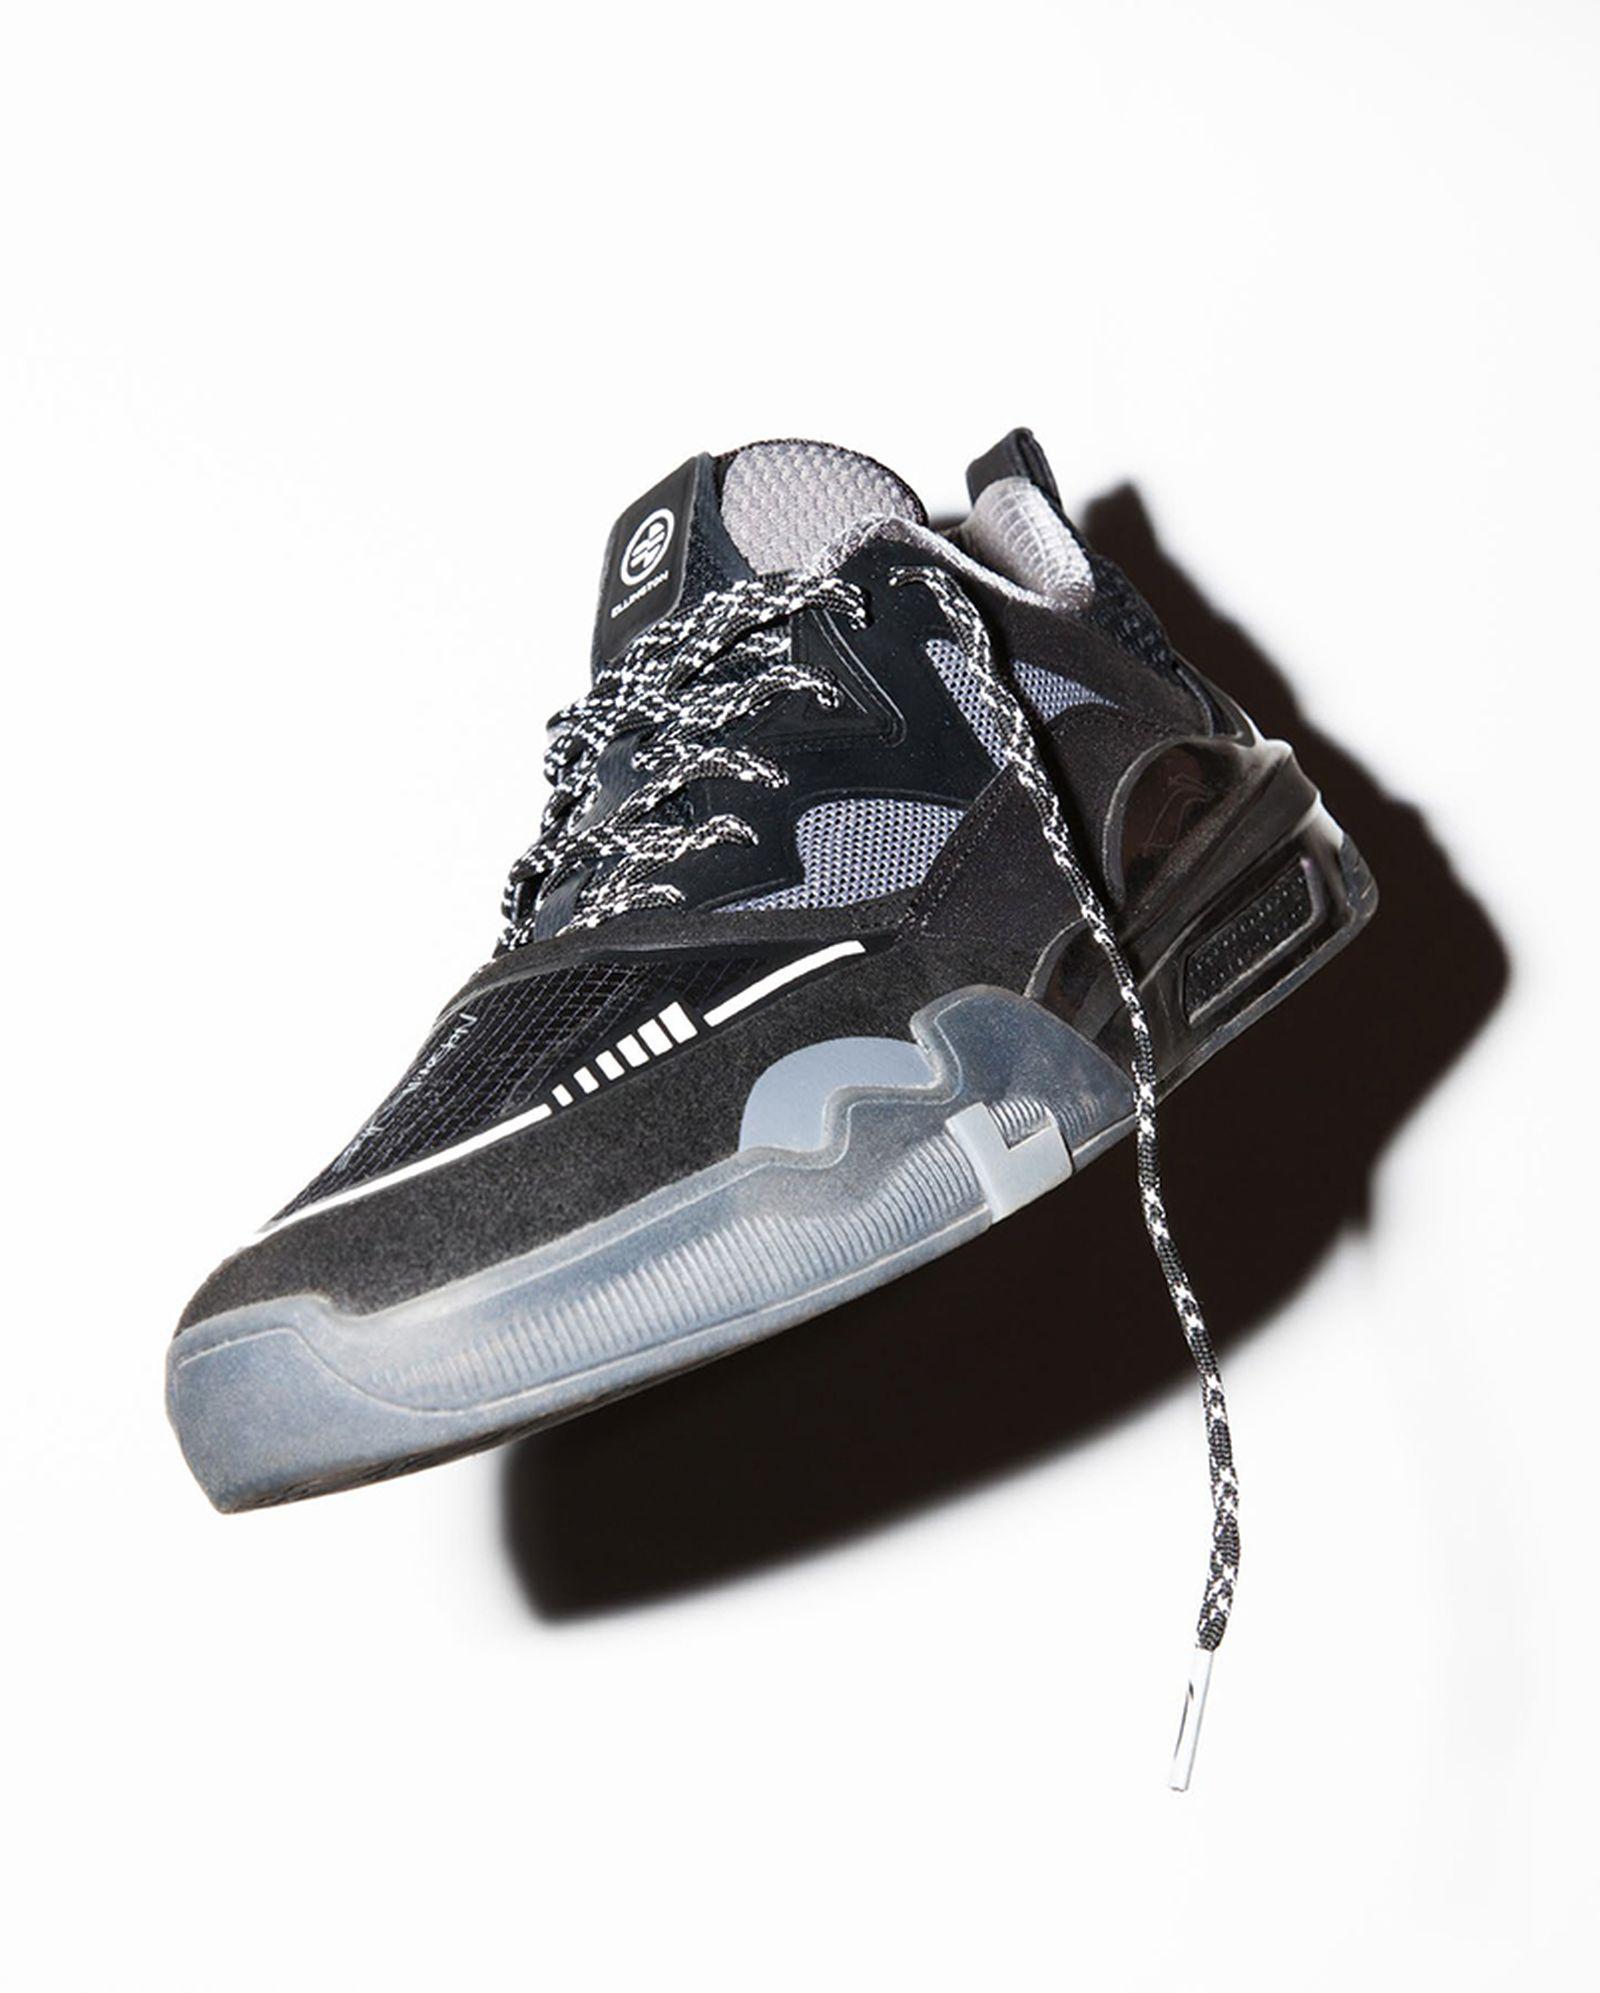 li-ning-skate-collection-erik-ellington-release-date-price-1-03